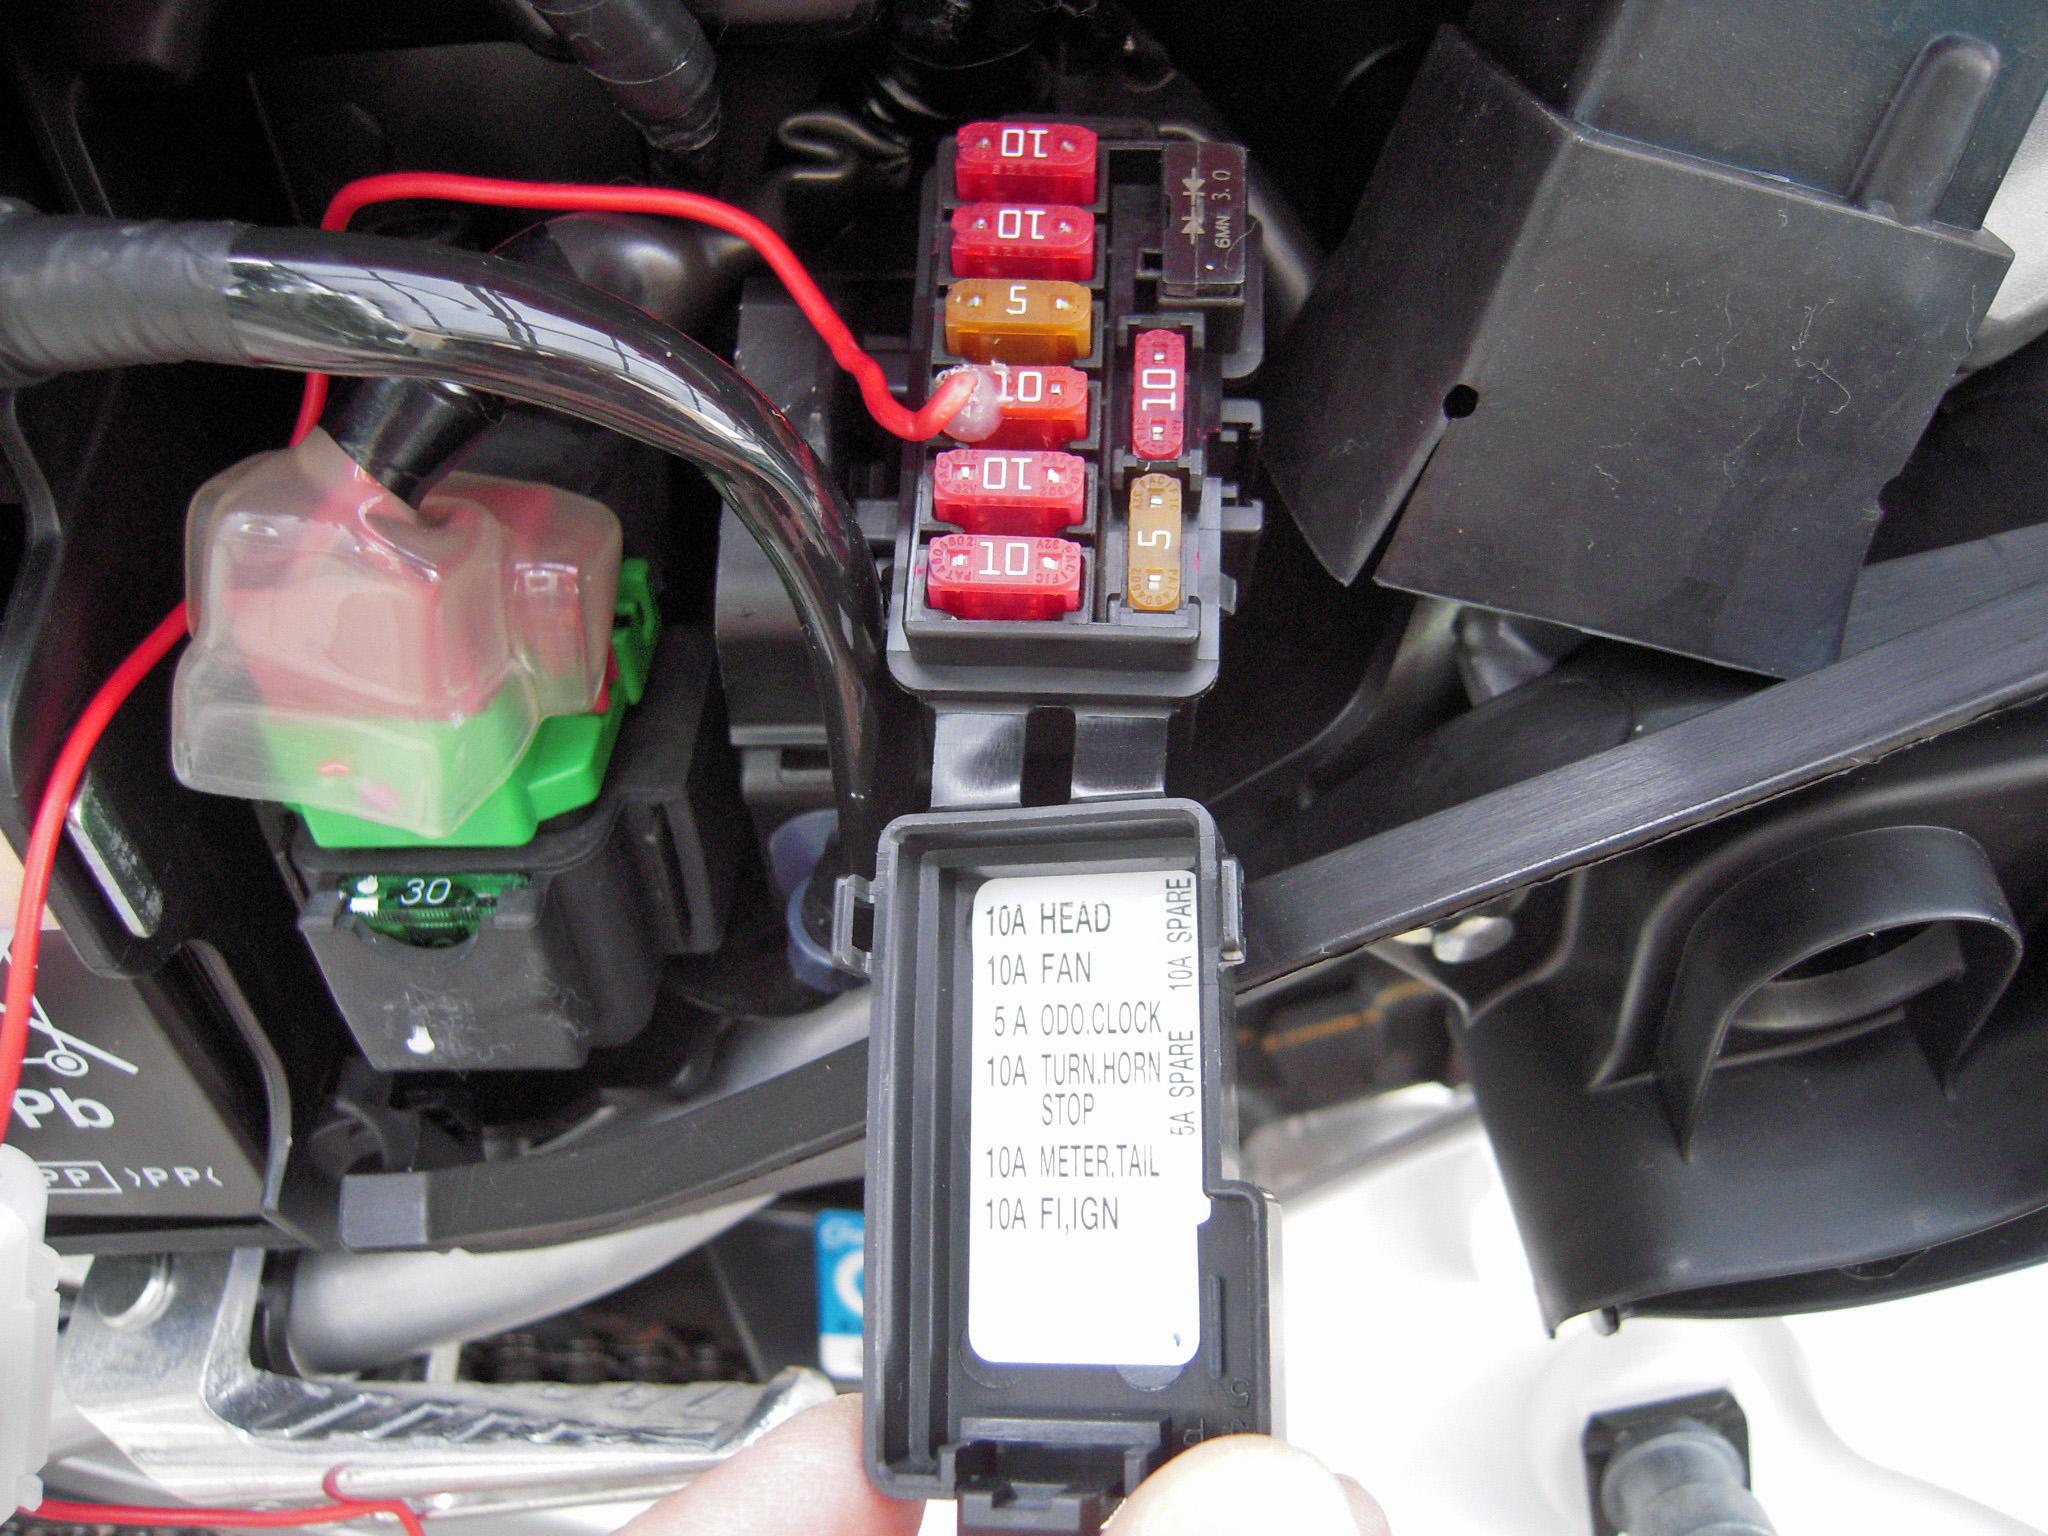 CRF250L MD44 ハンドル交換、USB電源取り付け | 趣味の乗り物ホーム ...